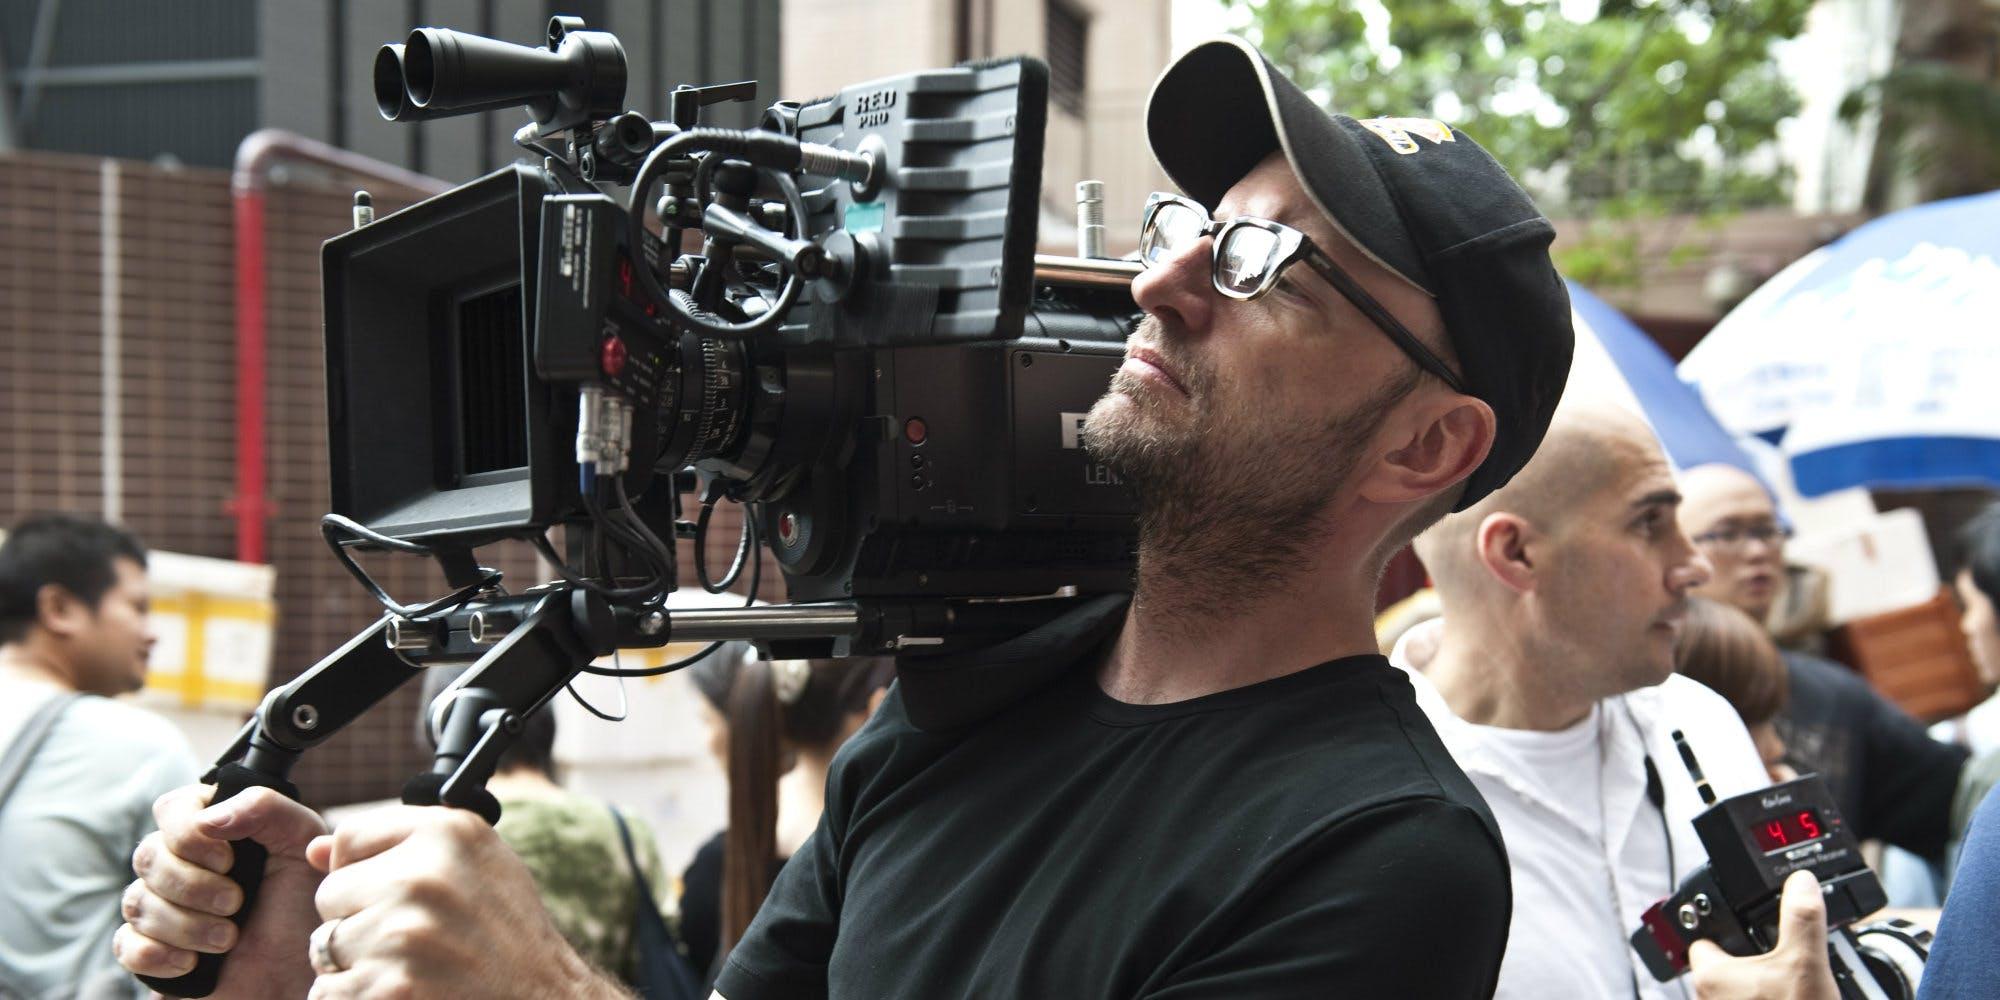 Steven-Soderbergh-filming-Contagion.jpg